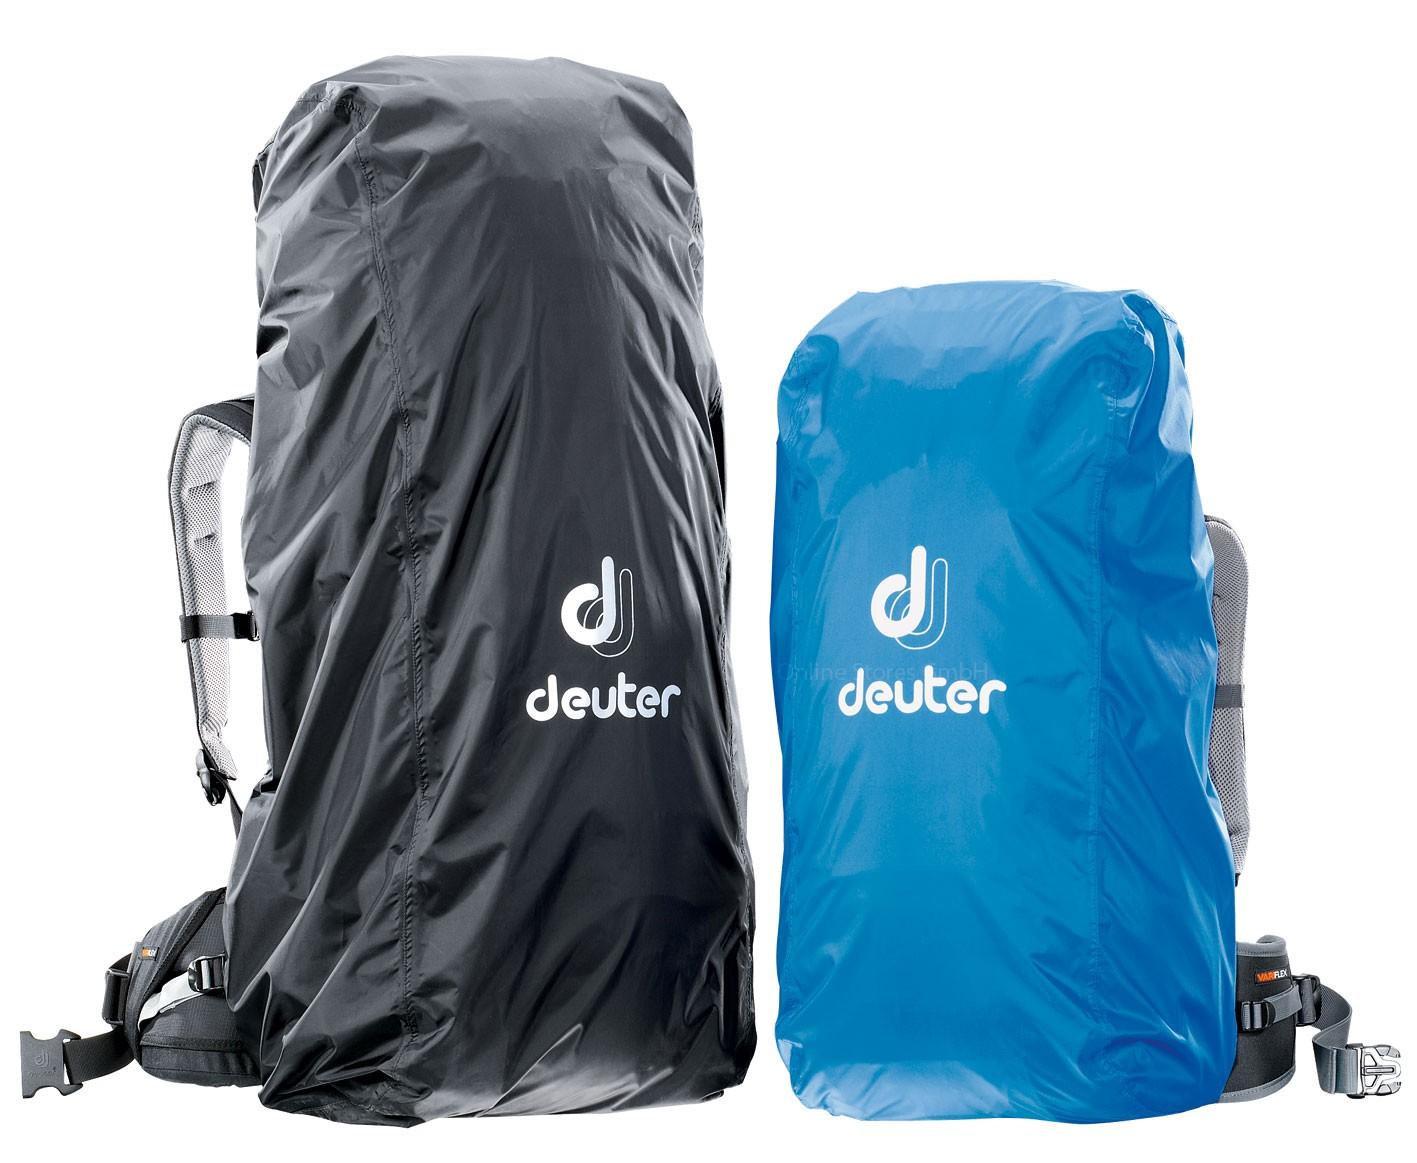 Deuter Raincover II